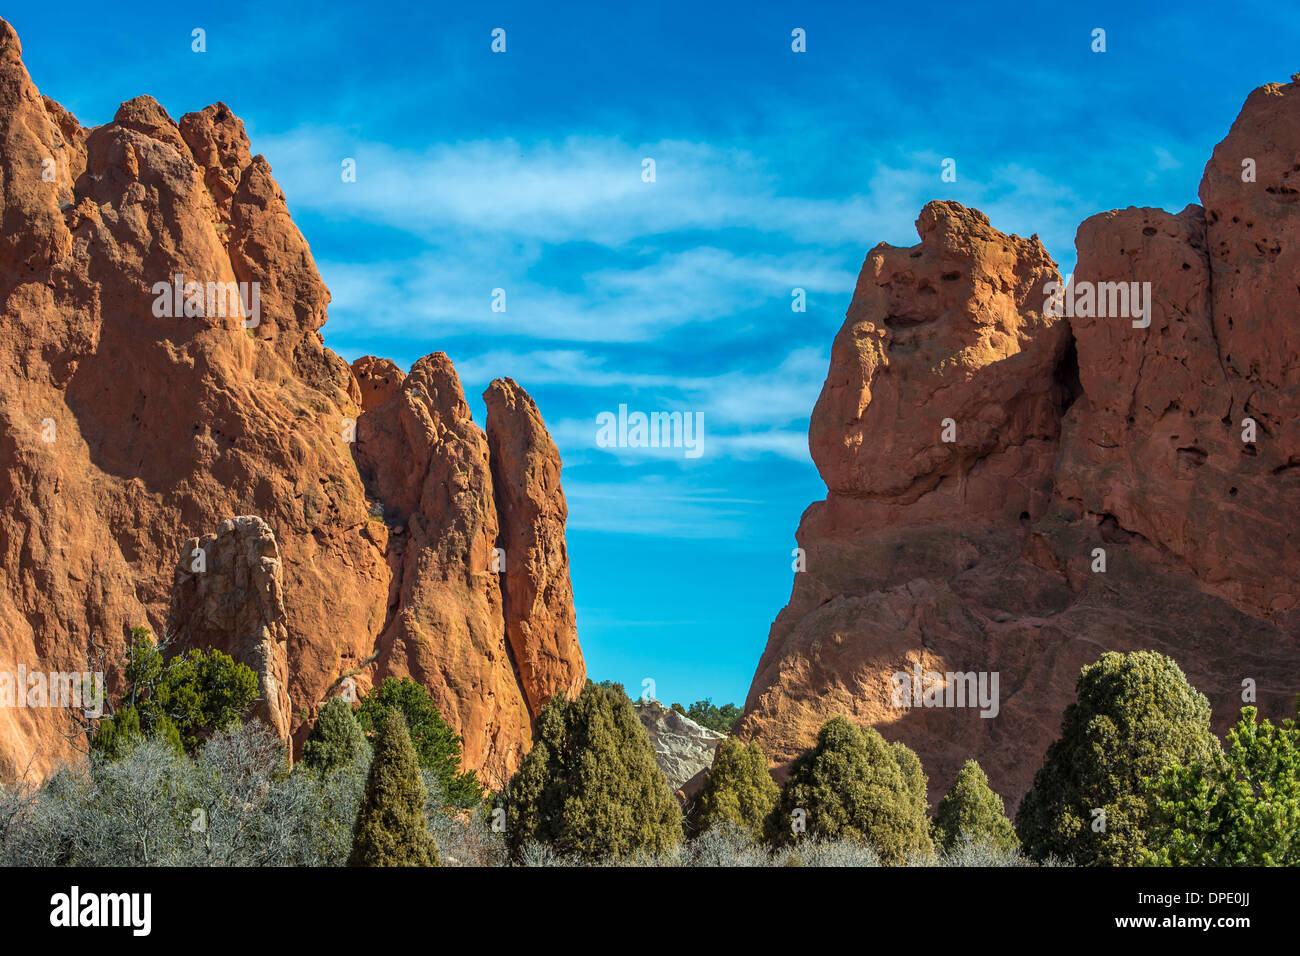 Garden Of The Gods background landscape just outside Colorado Springs, Colorado USA. - Stock Image